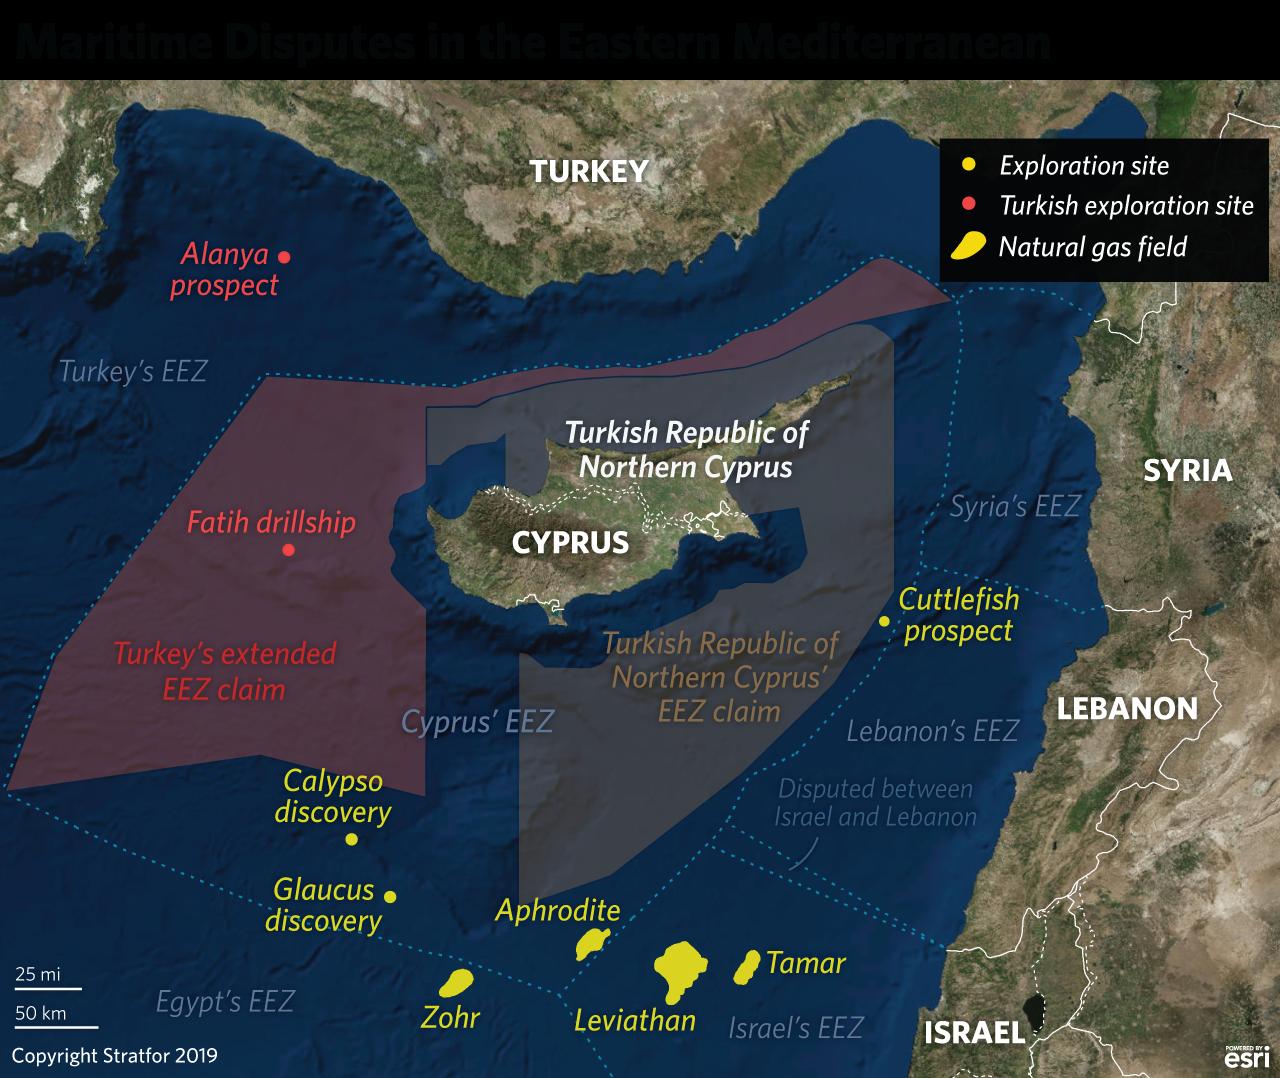 eastern mediterranean natural gas ile ilgili görsel sonucu